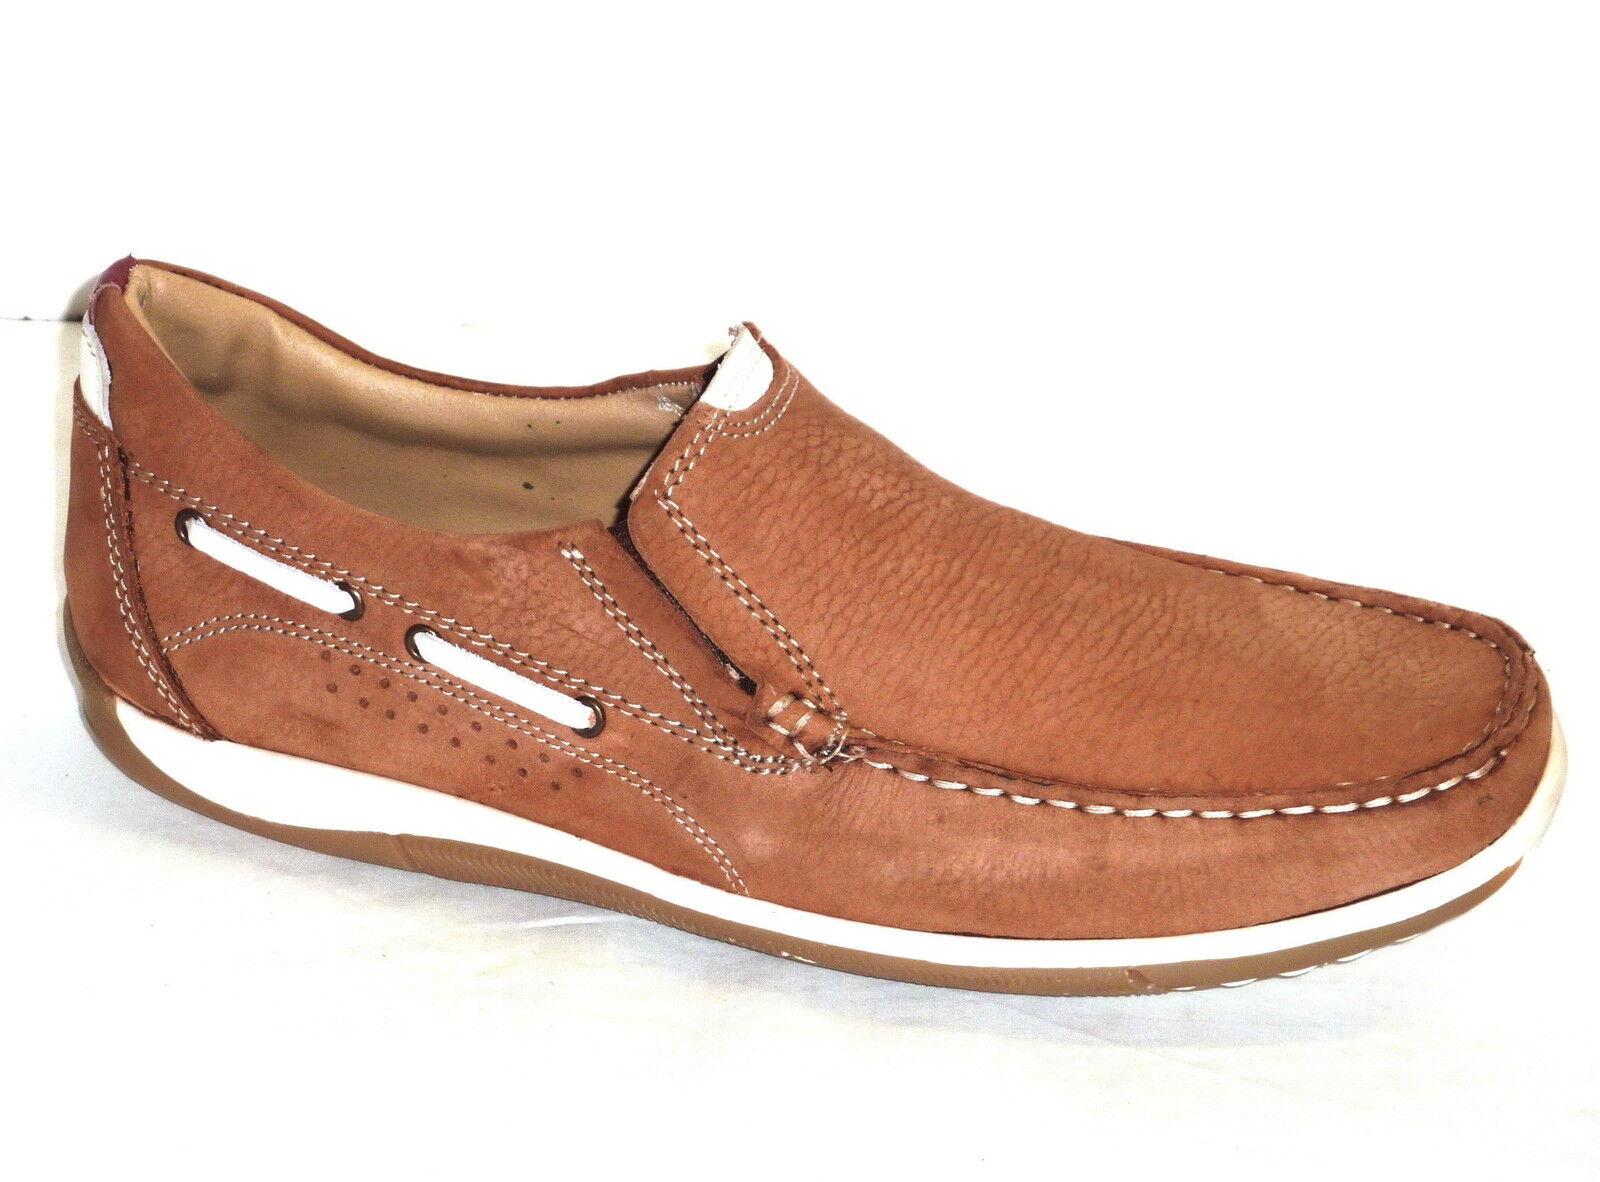 shoes men MOCASSINO ESTATE CASUAL TEMPO LIBERO PELLE NABUK brown n. 41